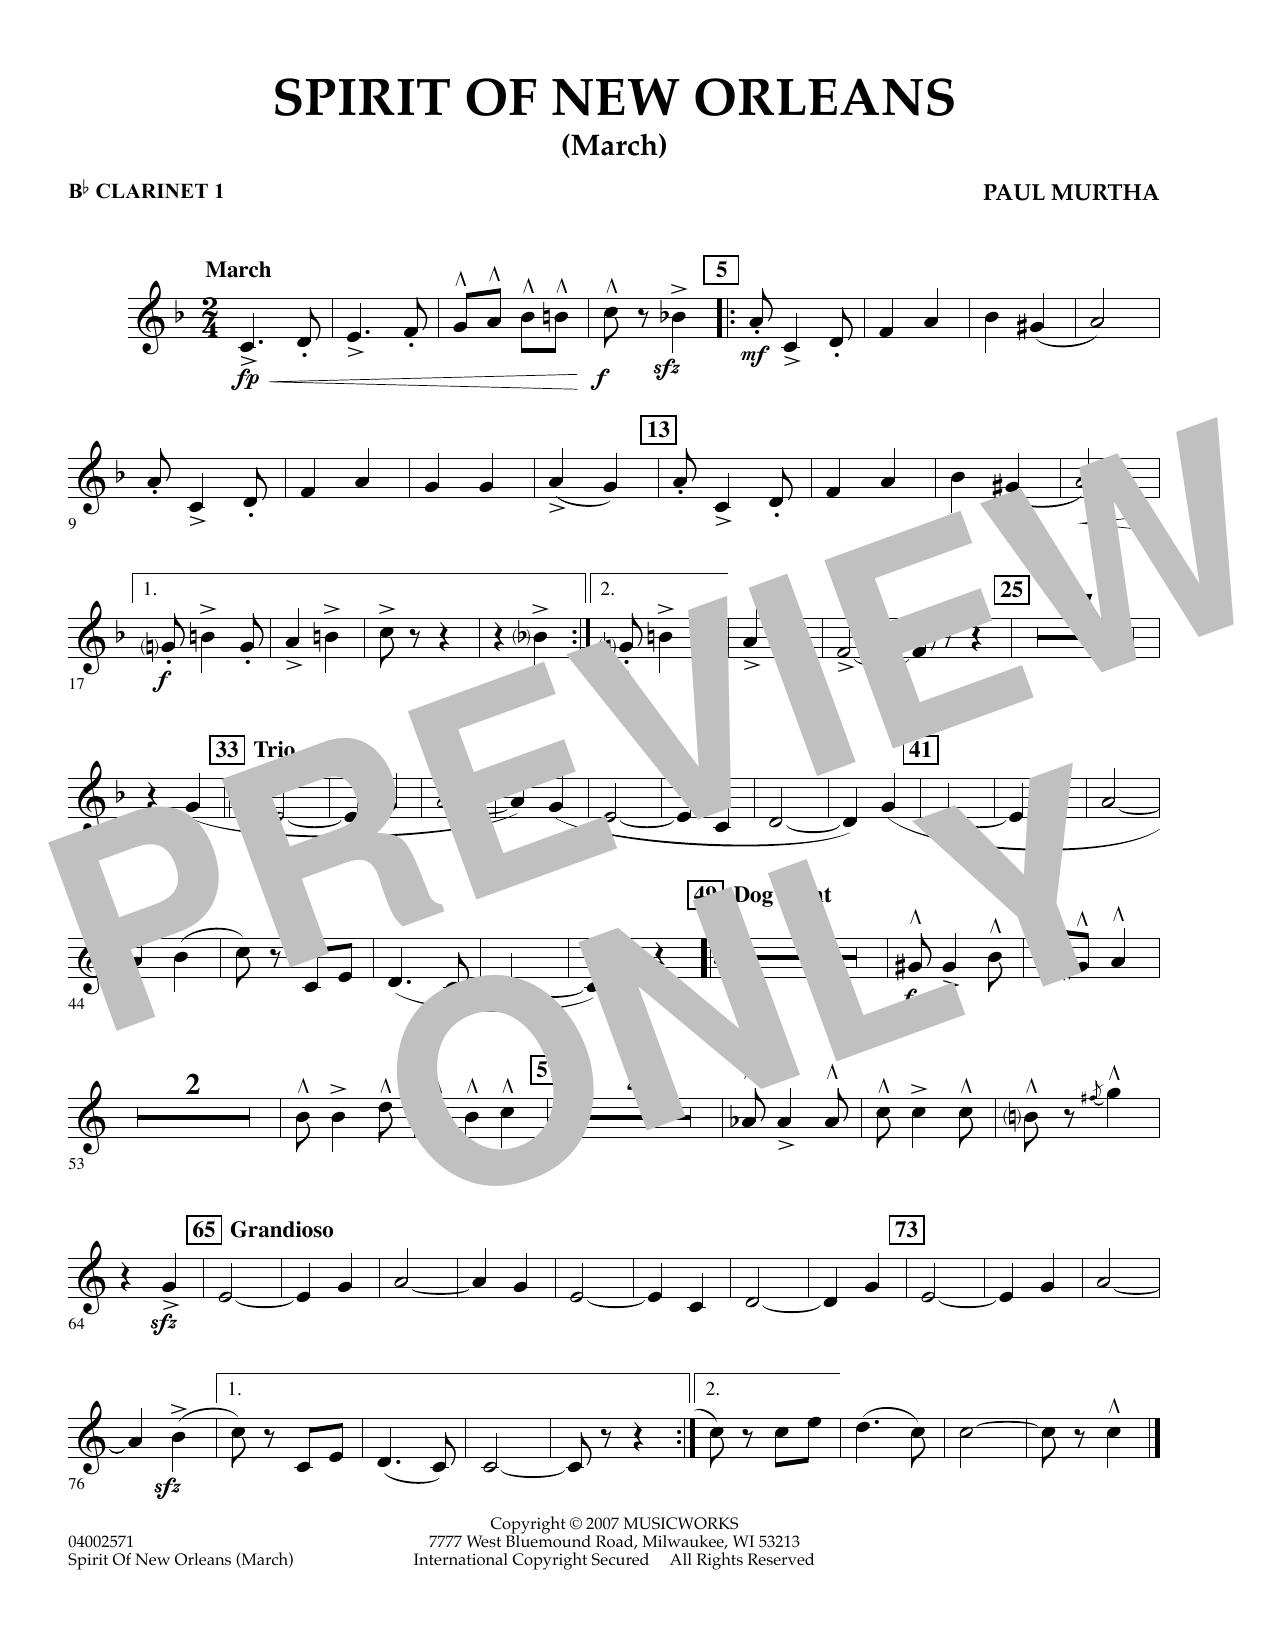 Spirit Of New Orleans (March) - Bb Clarinet 1 sheet music